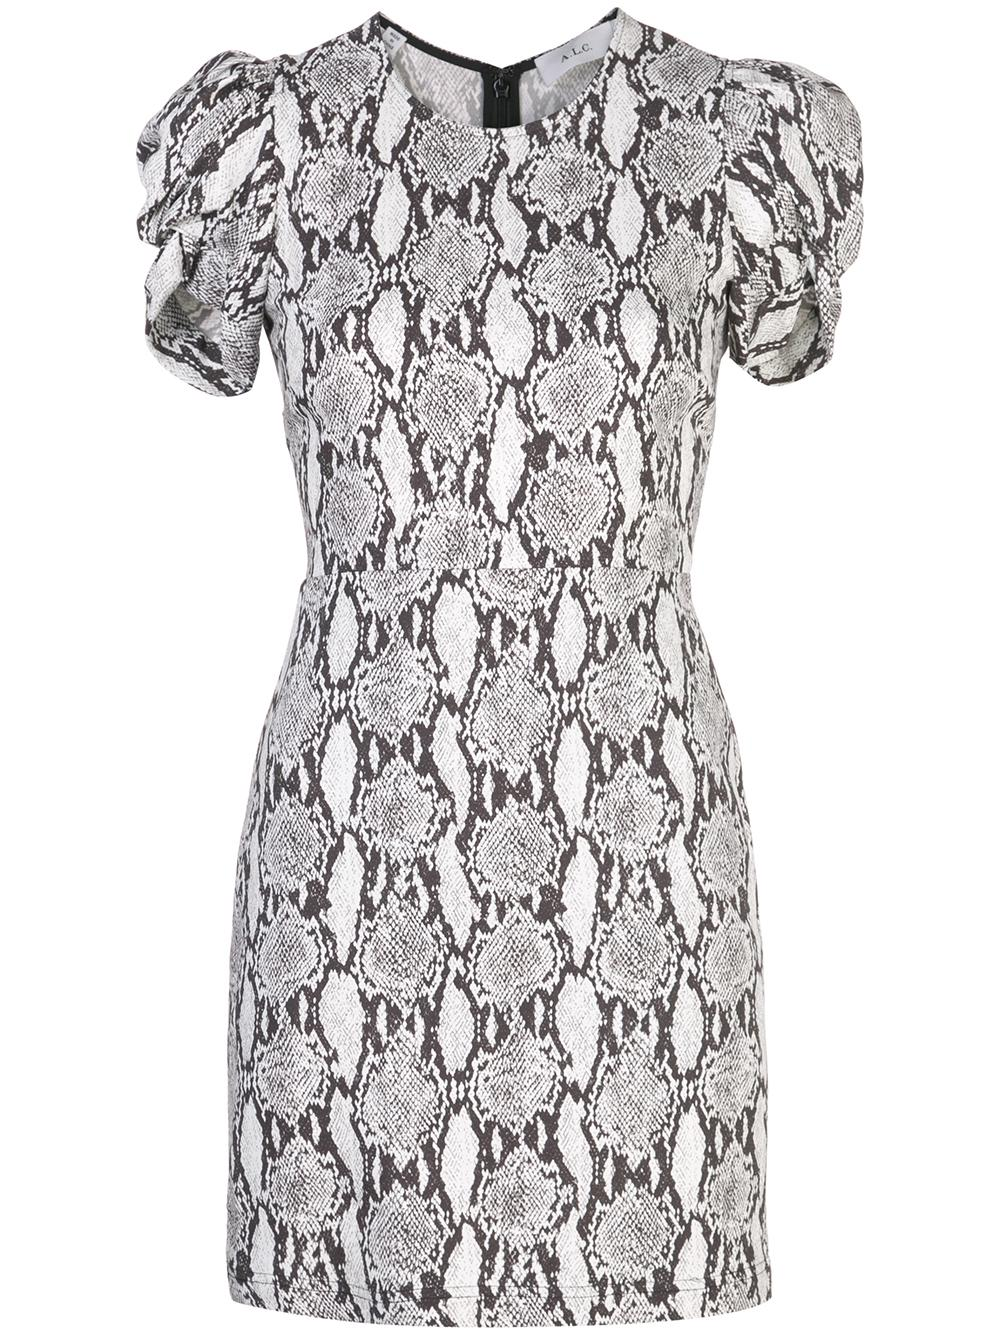 Brinley Snake-Print Dress